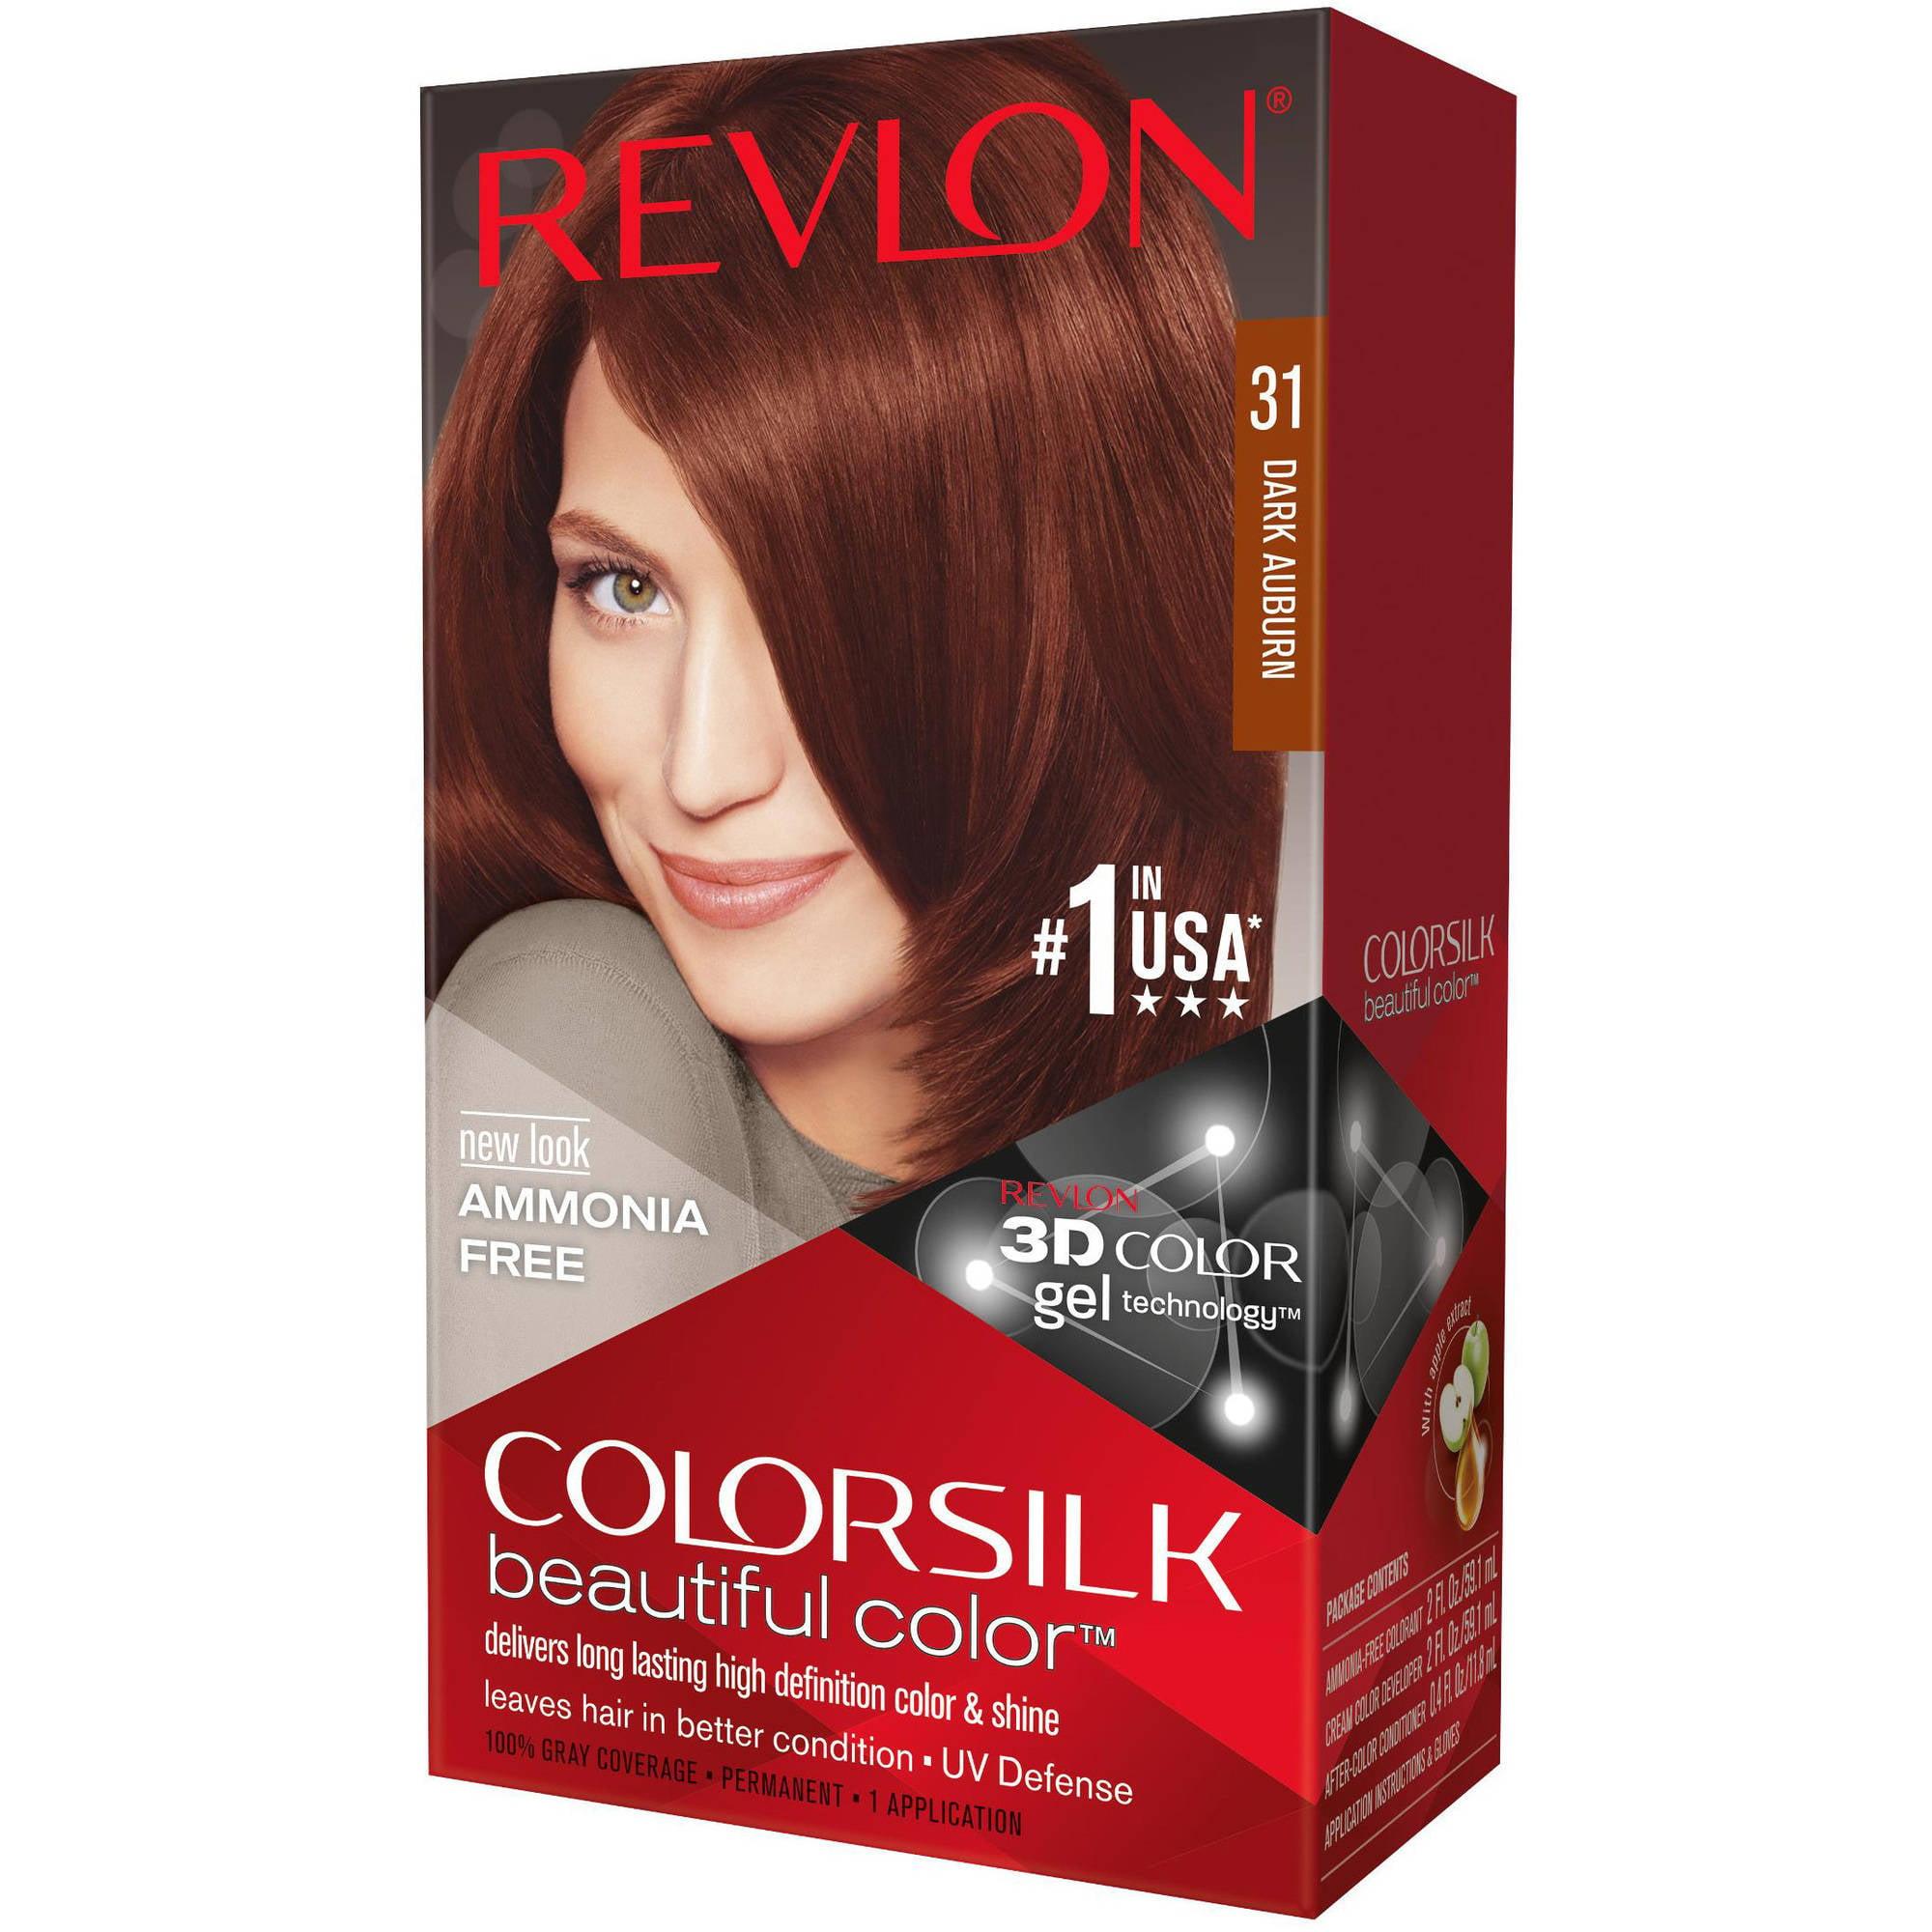 Revlon Colorsilk Beautiful Color Permanent Hair Color, 31 Dark Auburn